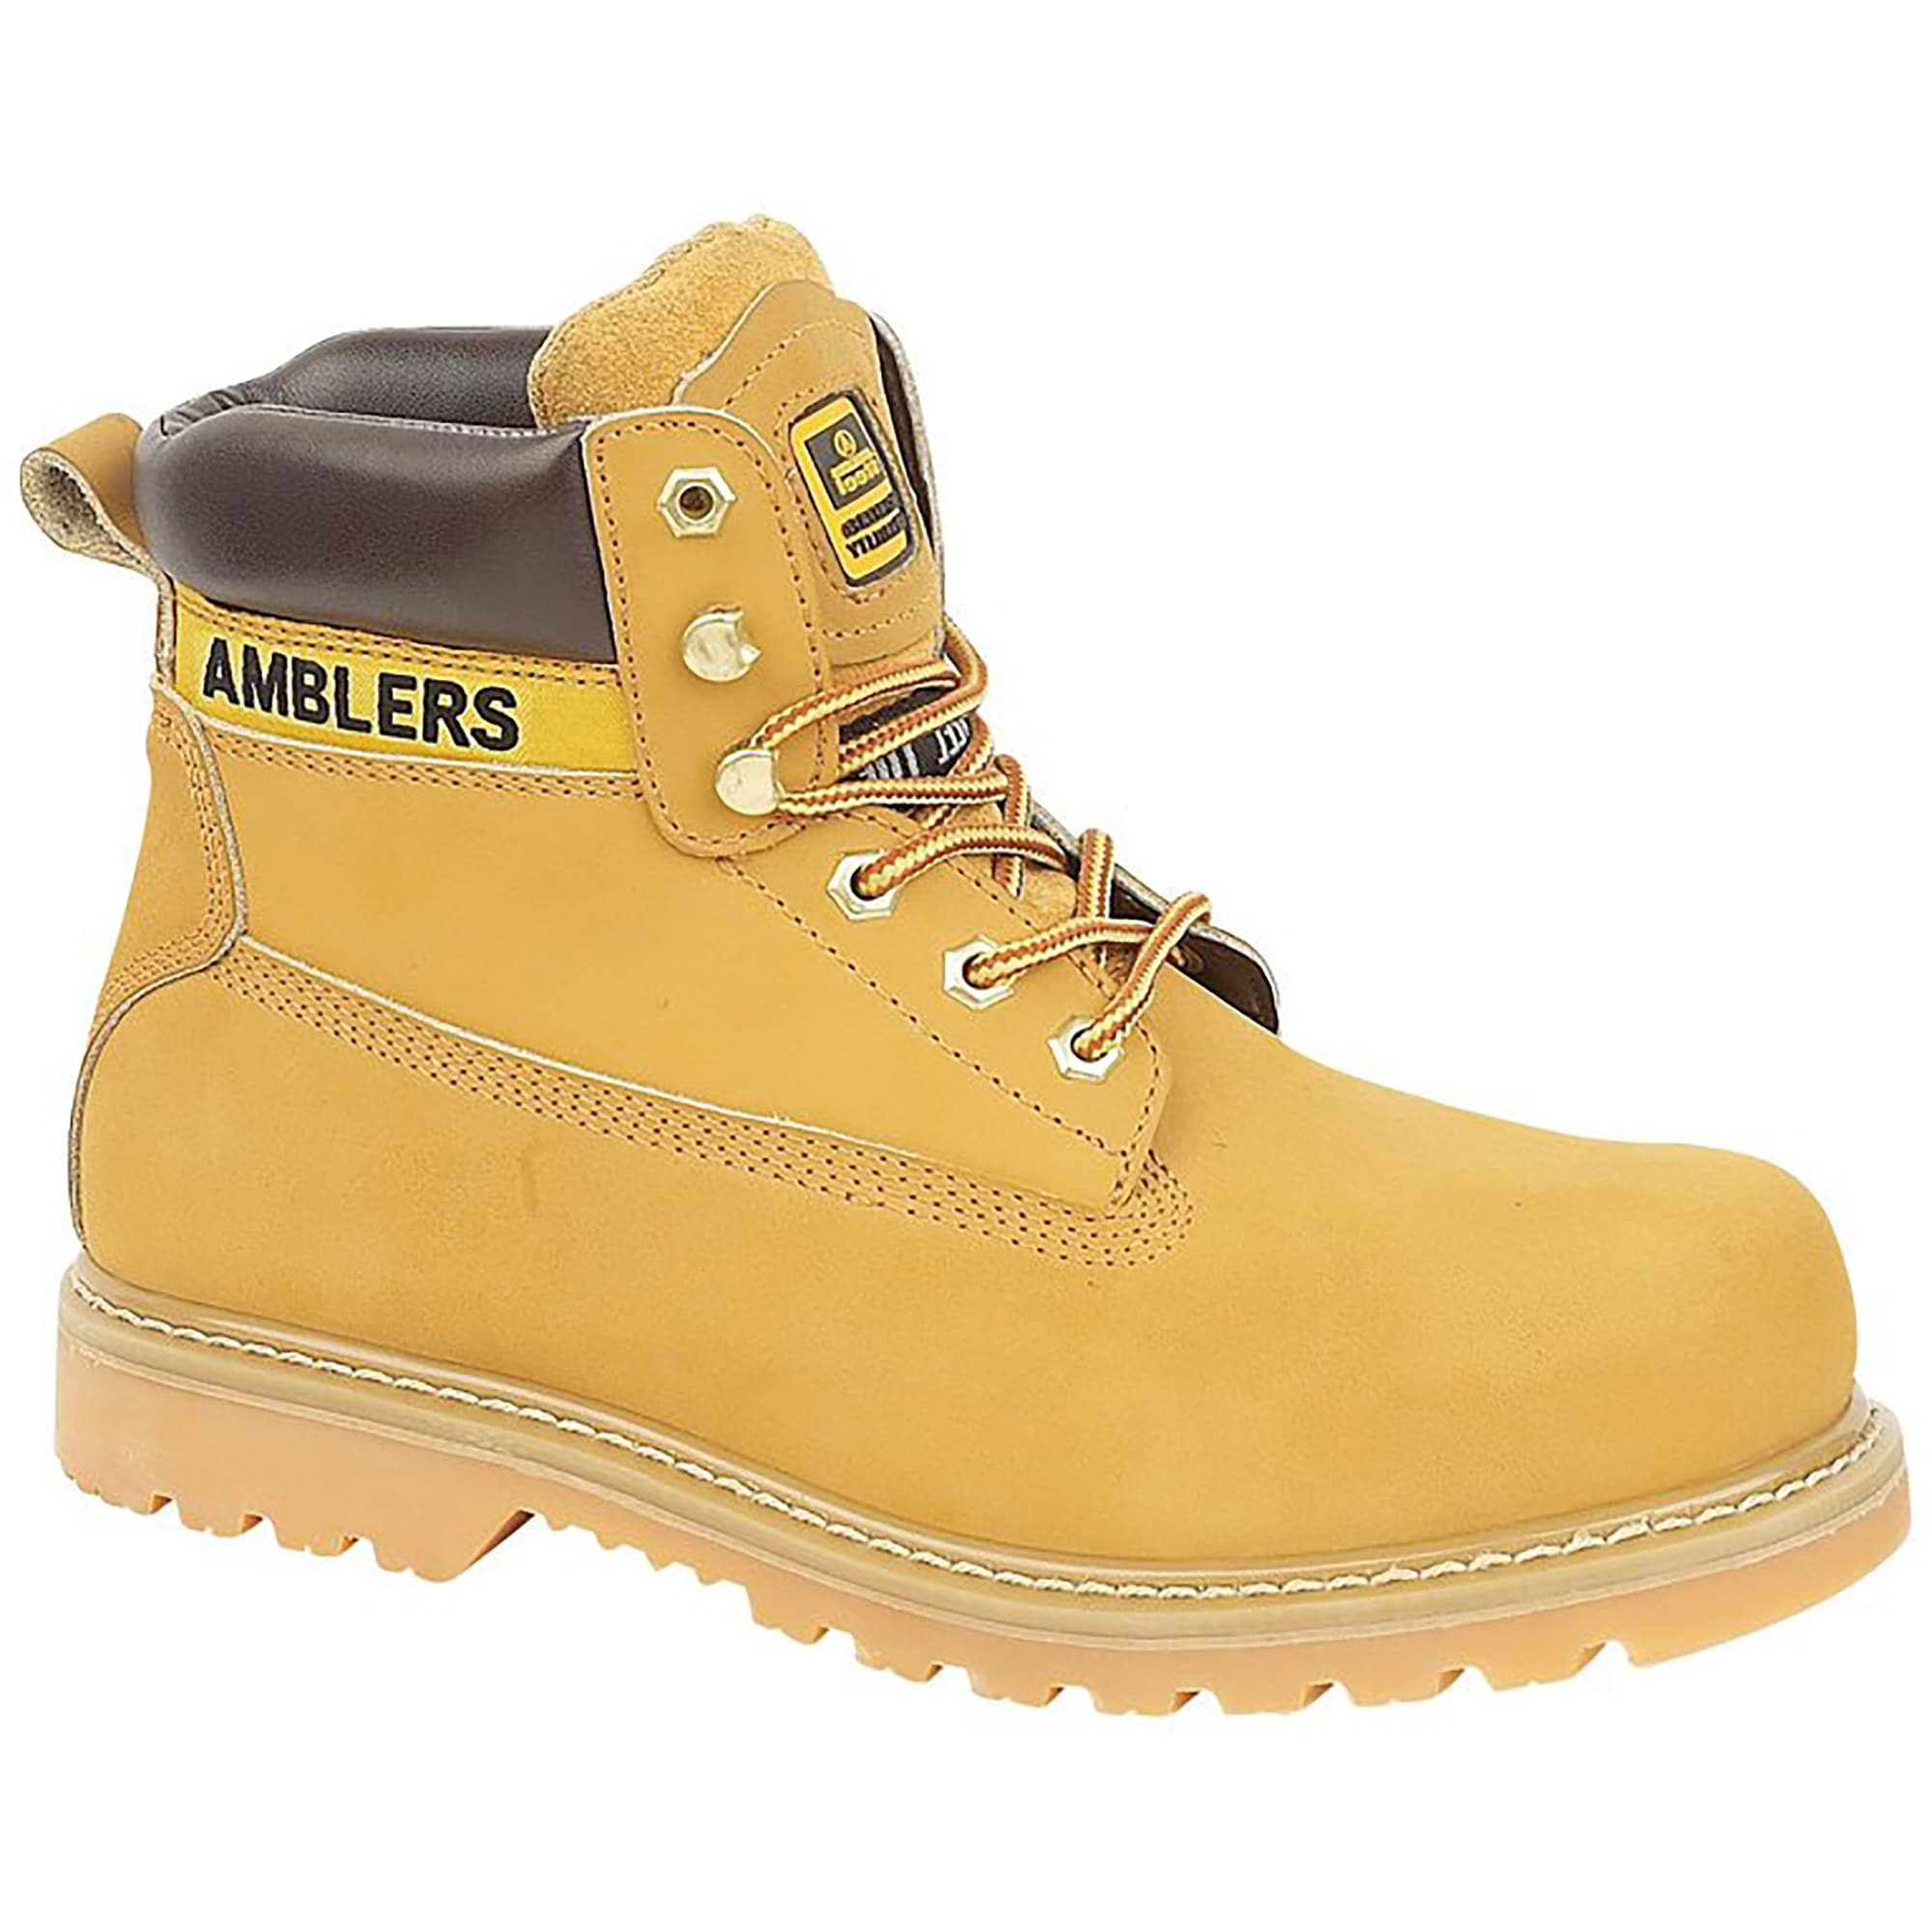 Image of Amblers Safety Arbeitsschuh »FS7 Damen Stahlkappen-Schuhe / e / Stiefel«